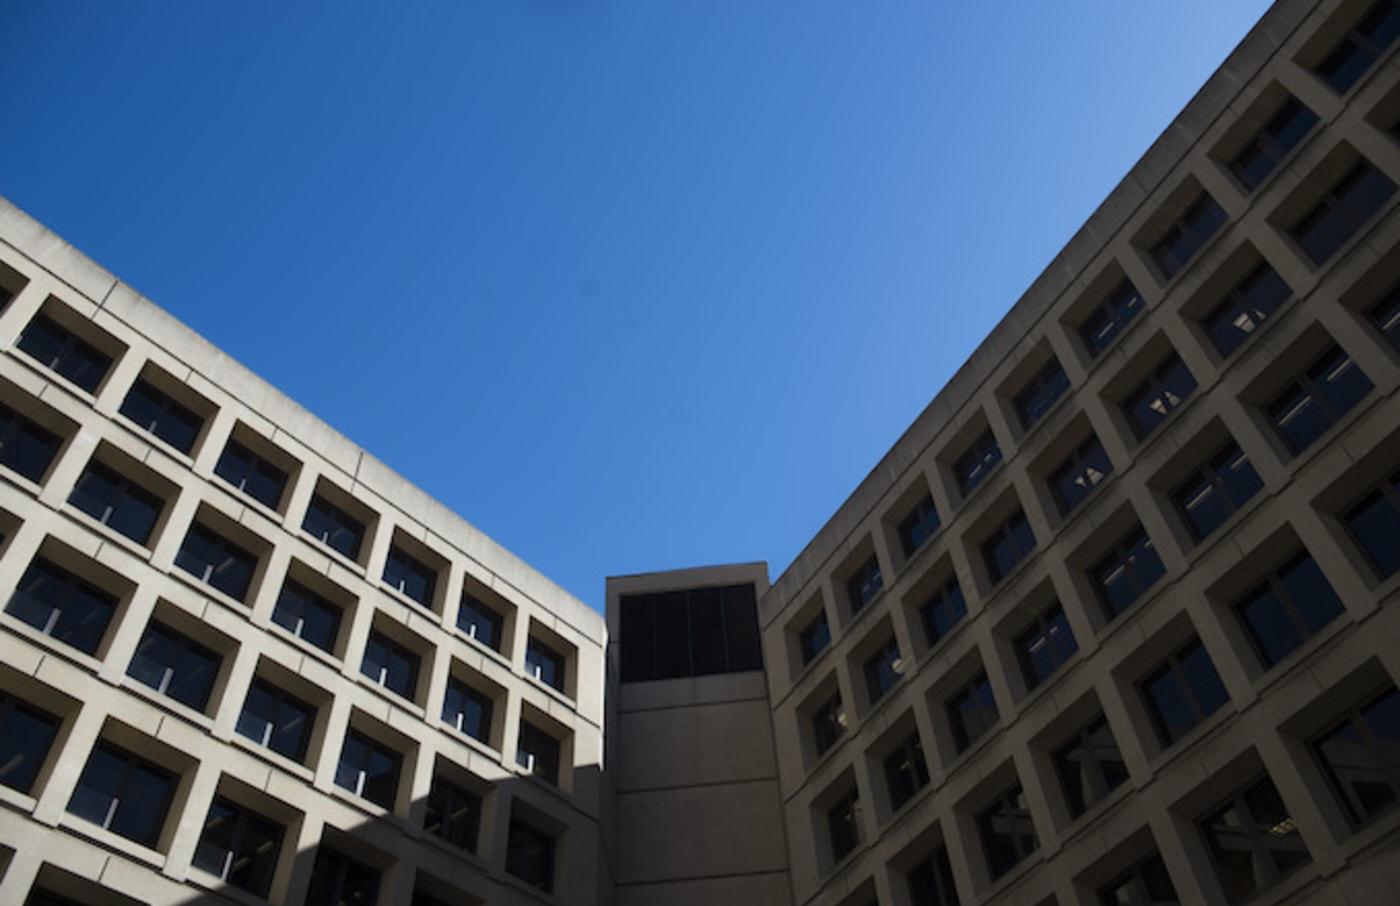 The FBI headquarters